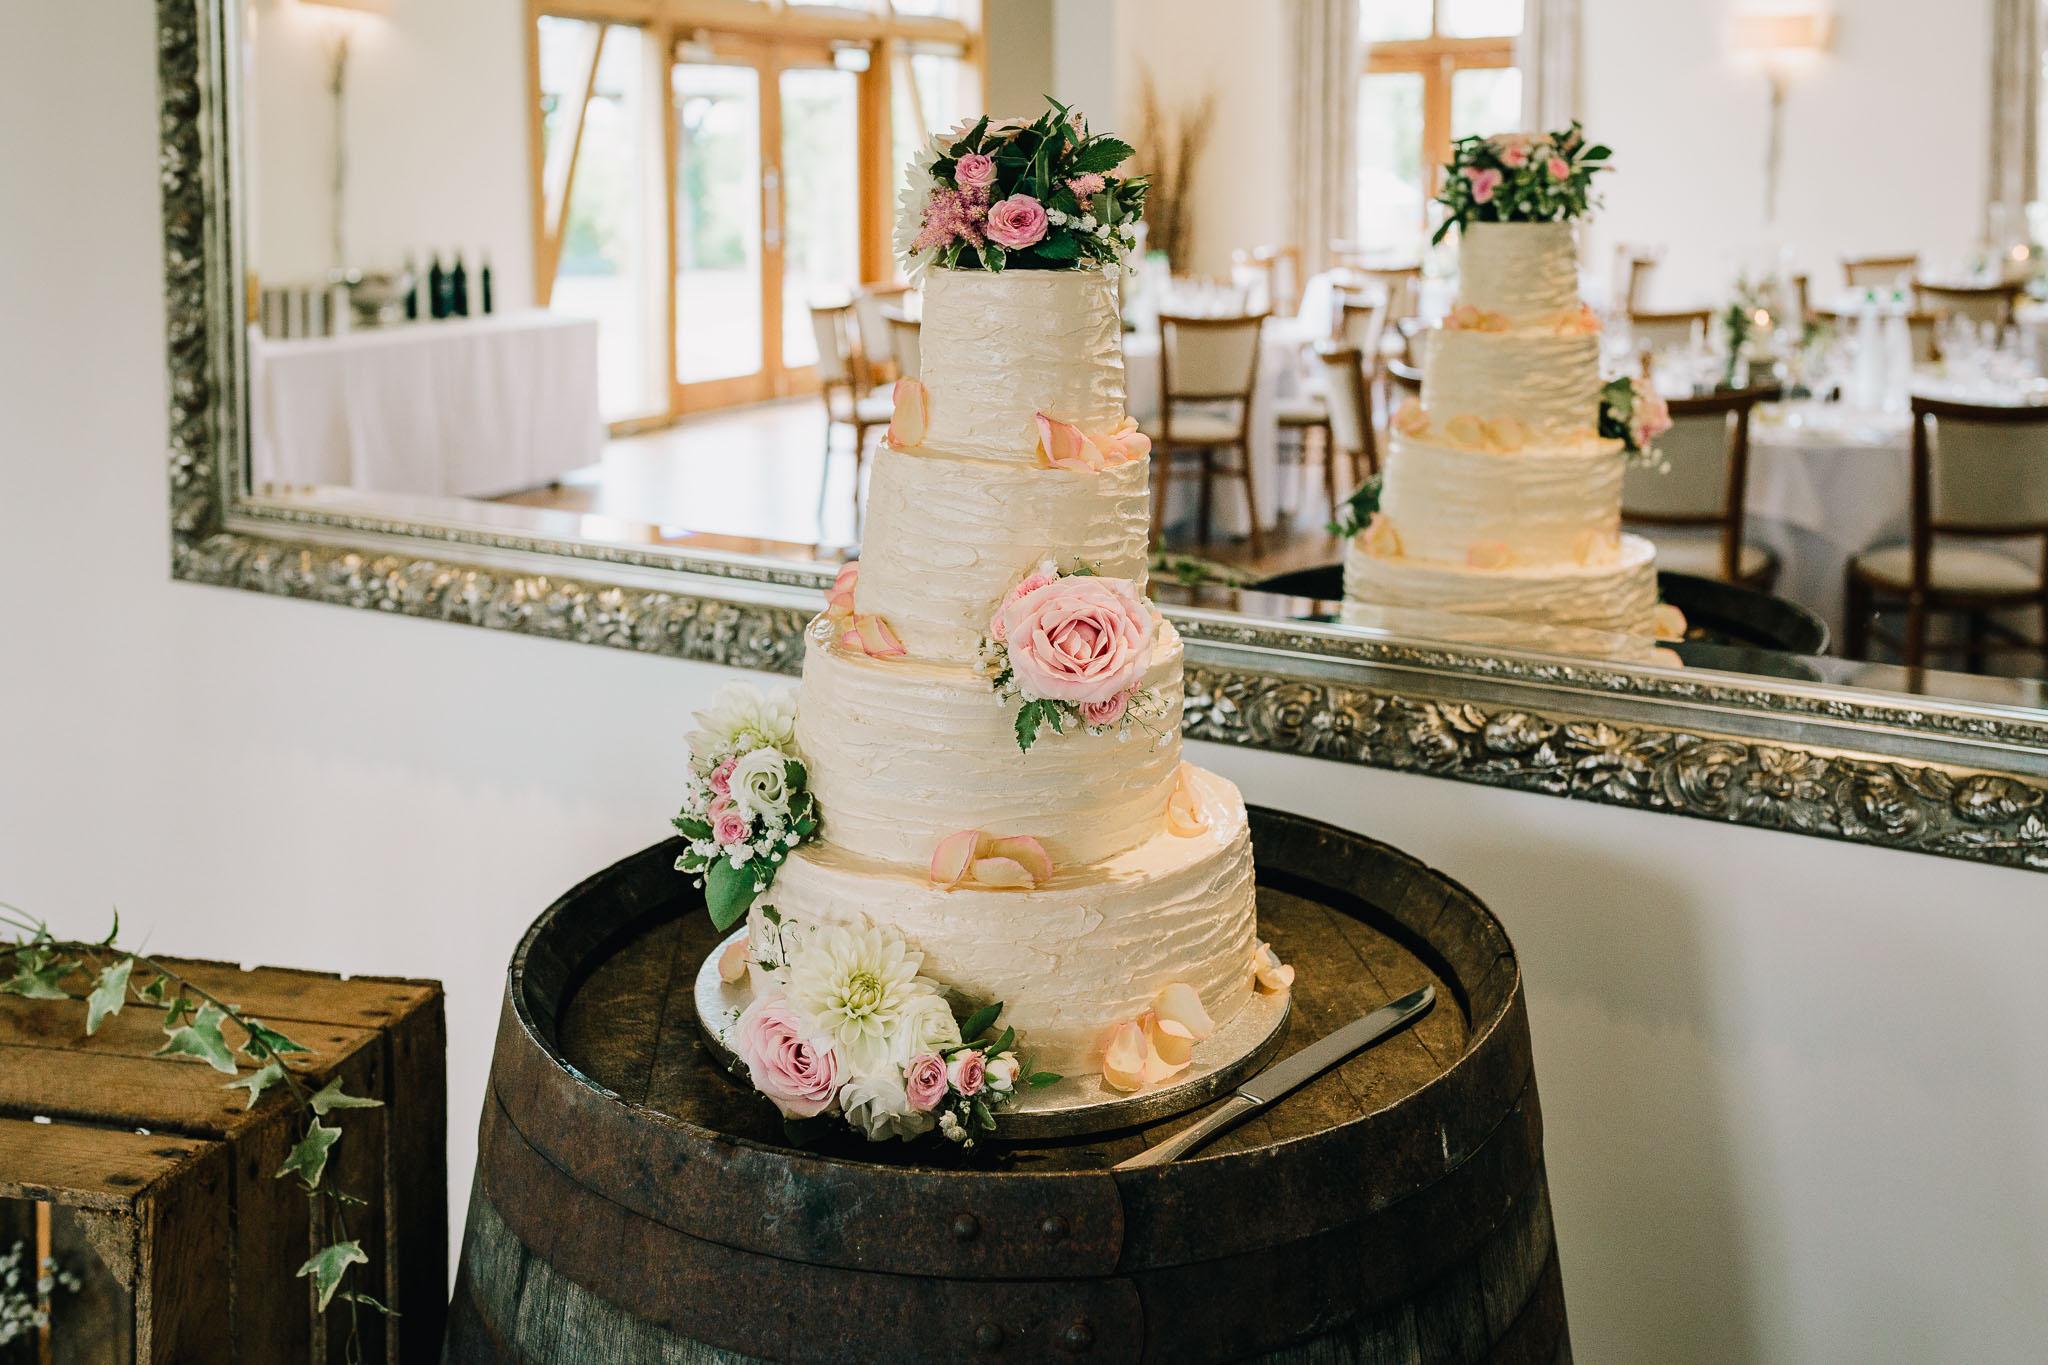 HANDMADE WEDDING CAKE WITH FLOWERS